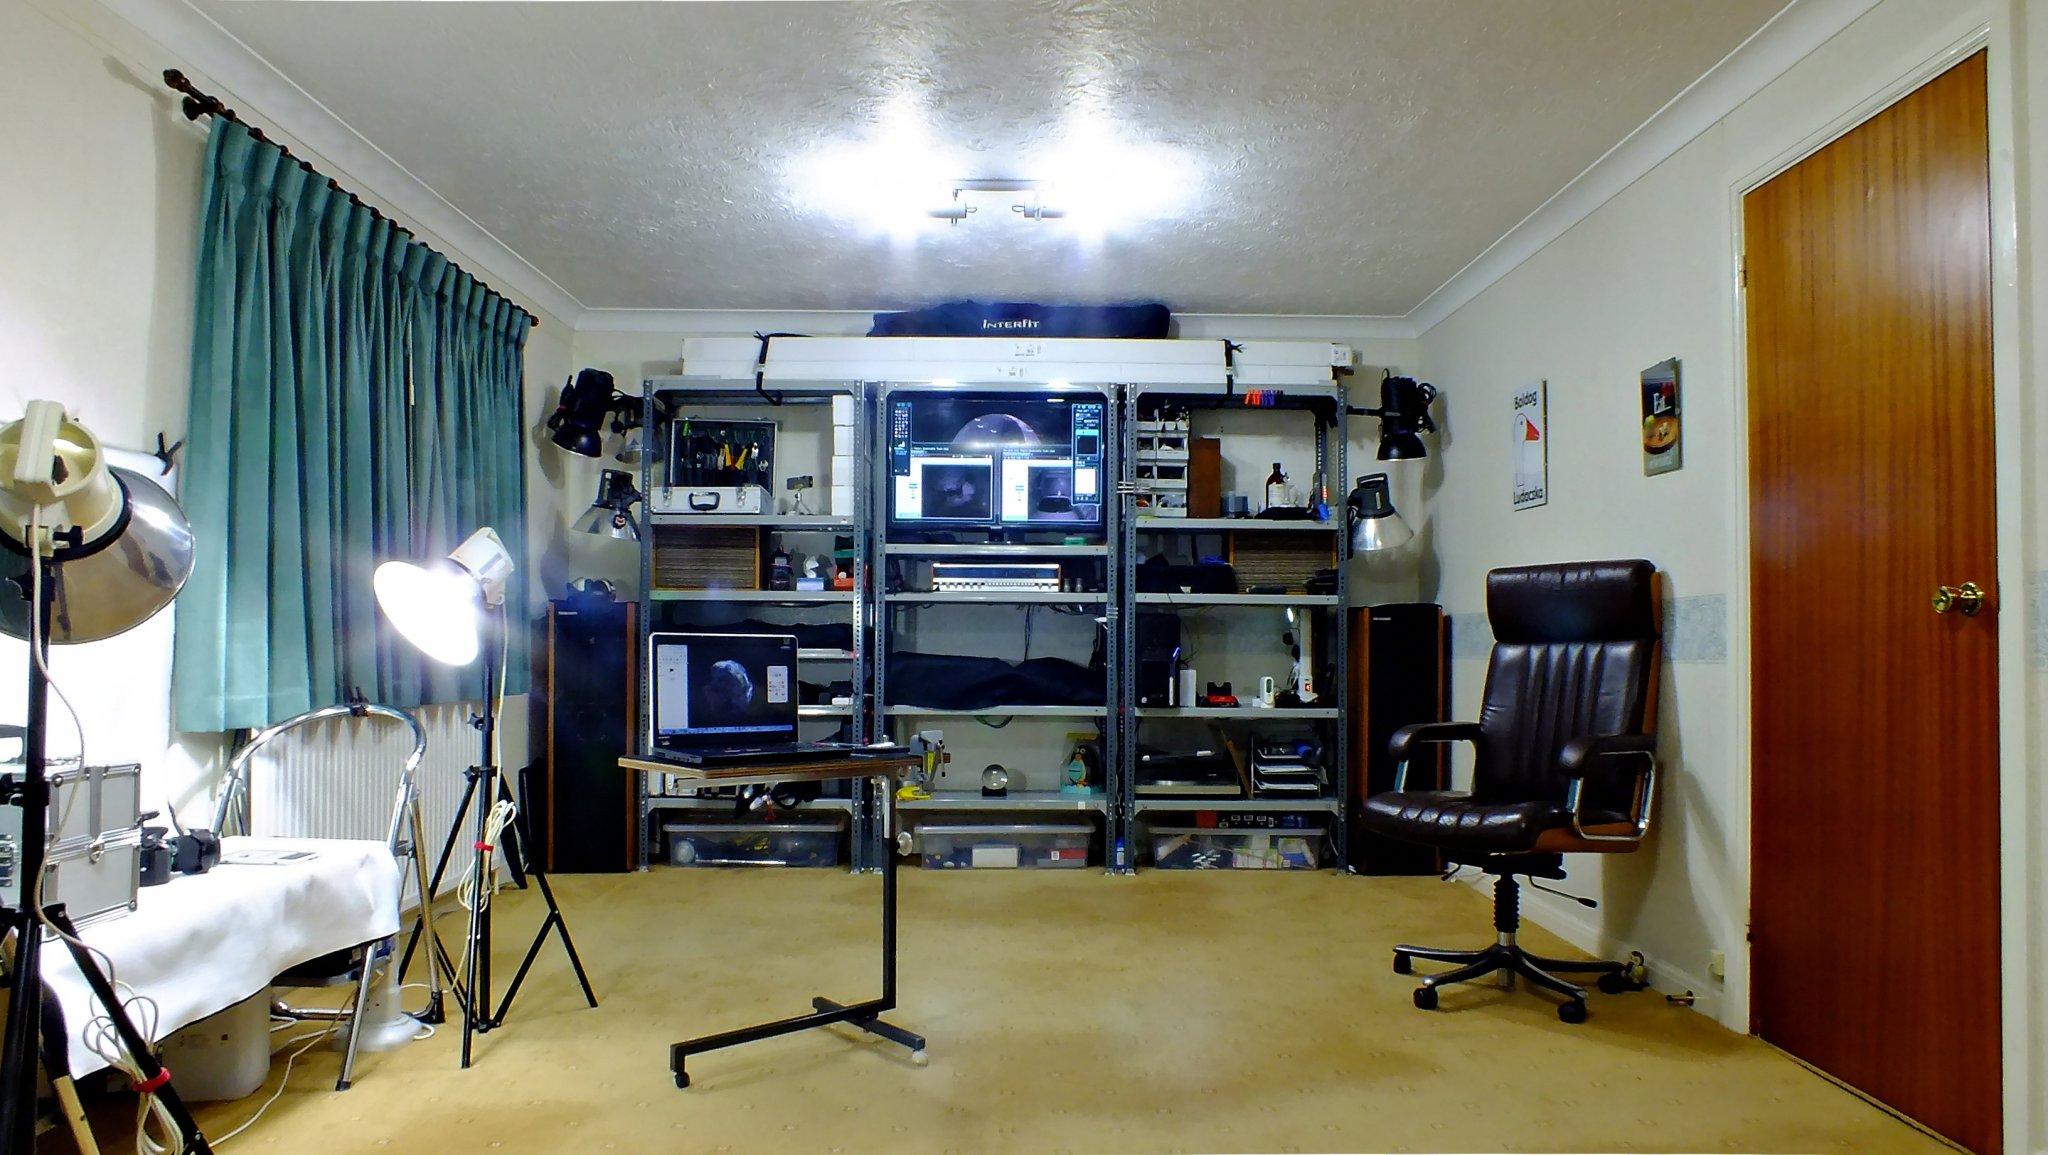 20130915-dscf8267-studio